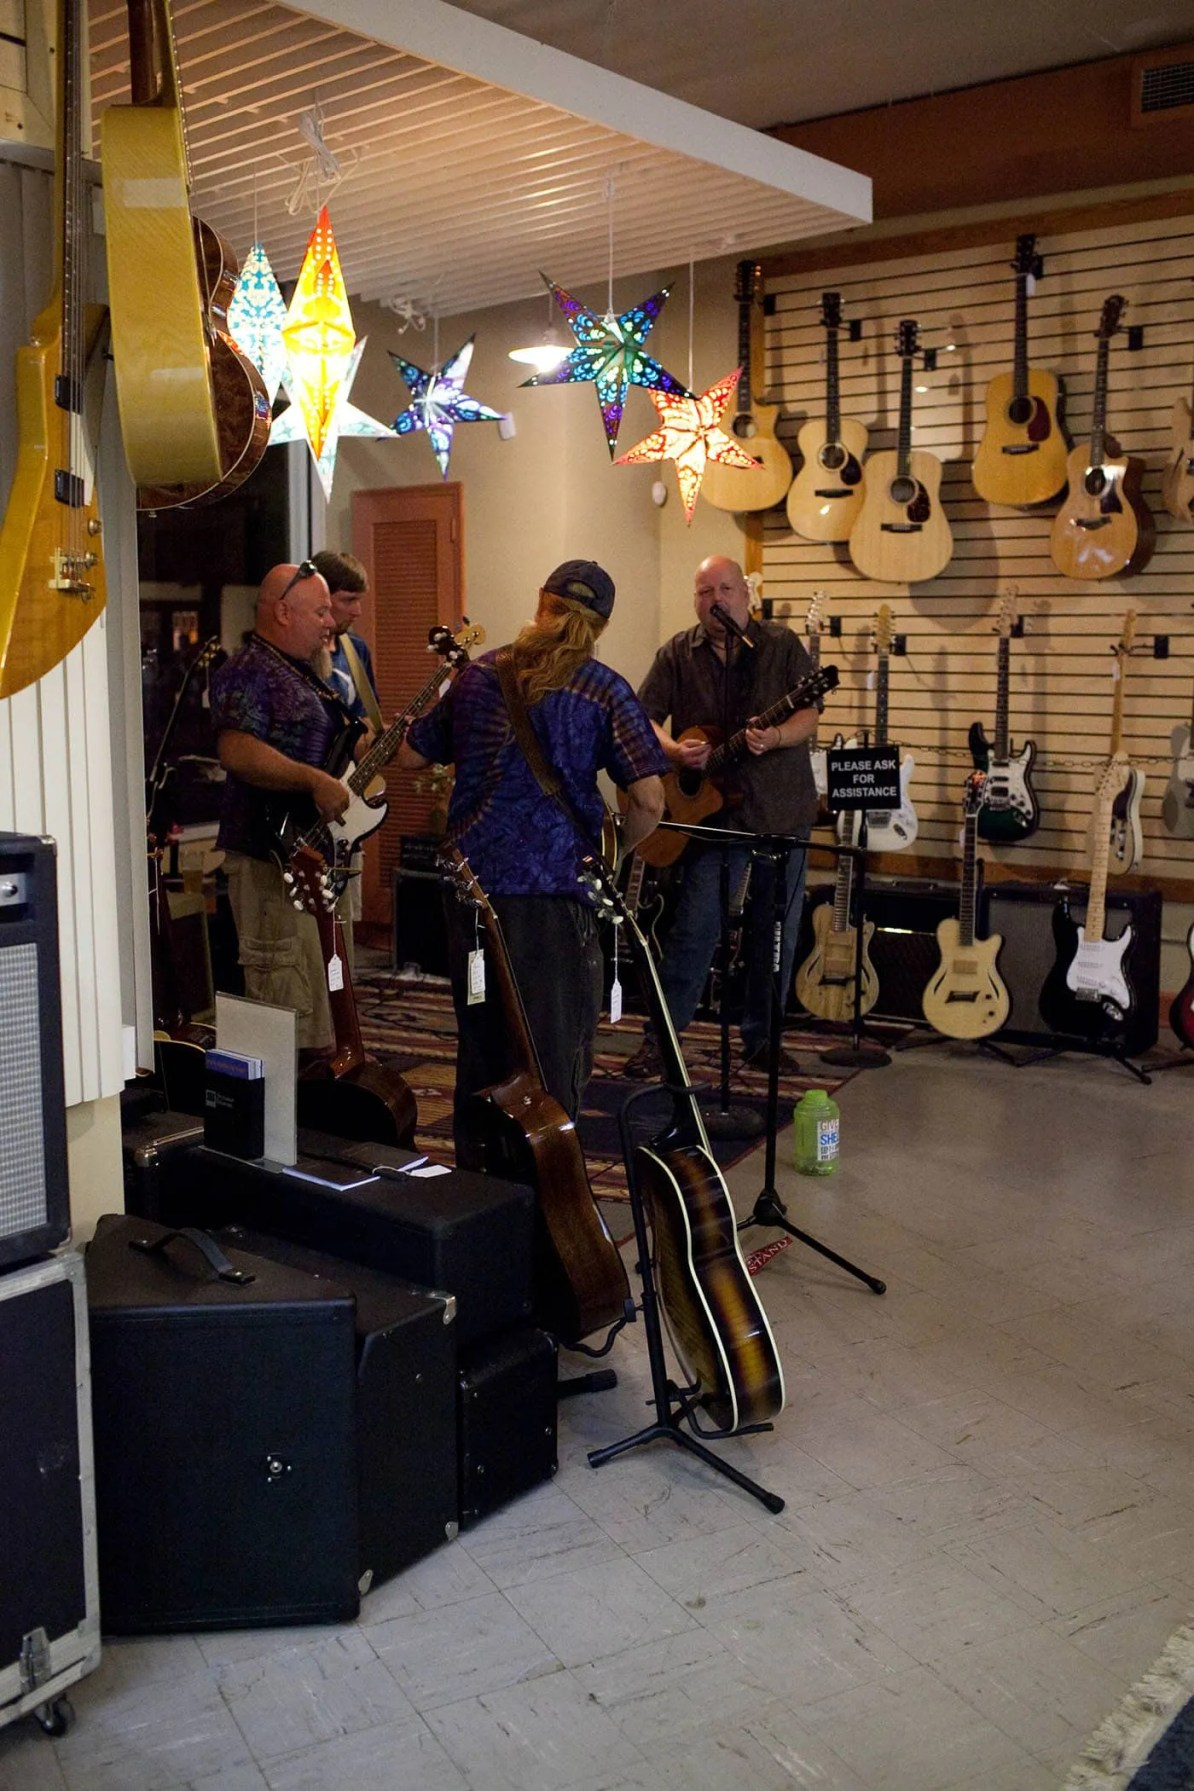 Performance at a guitar shop in Winston-Salem, North Carolina.